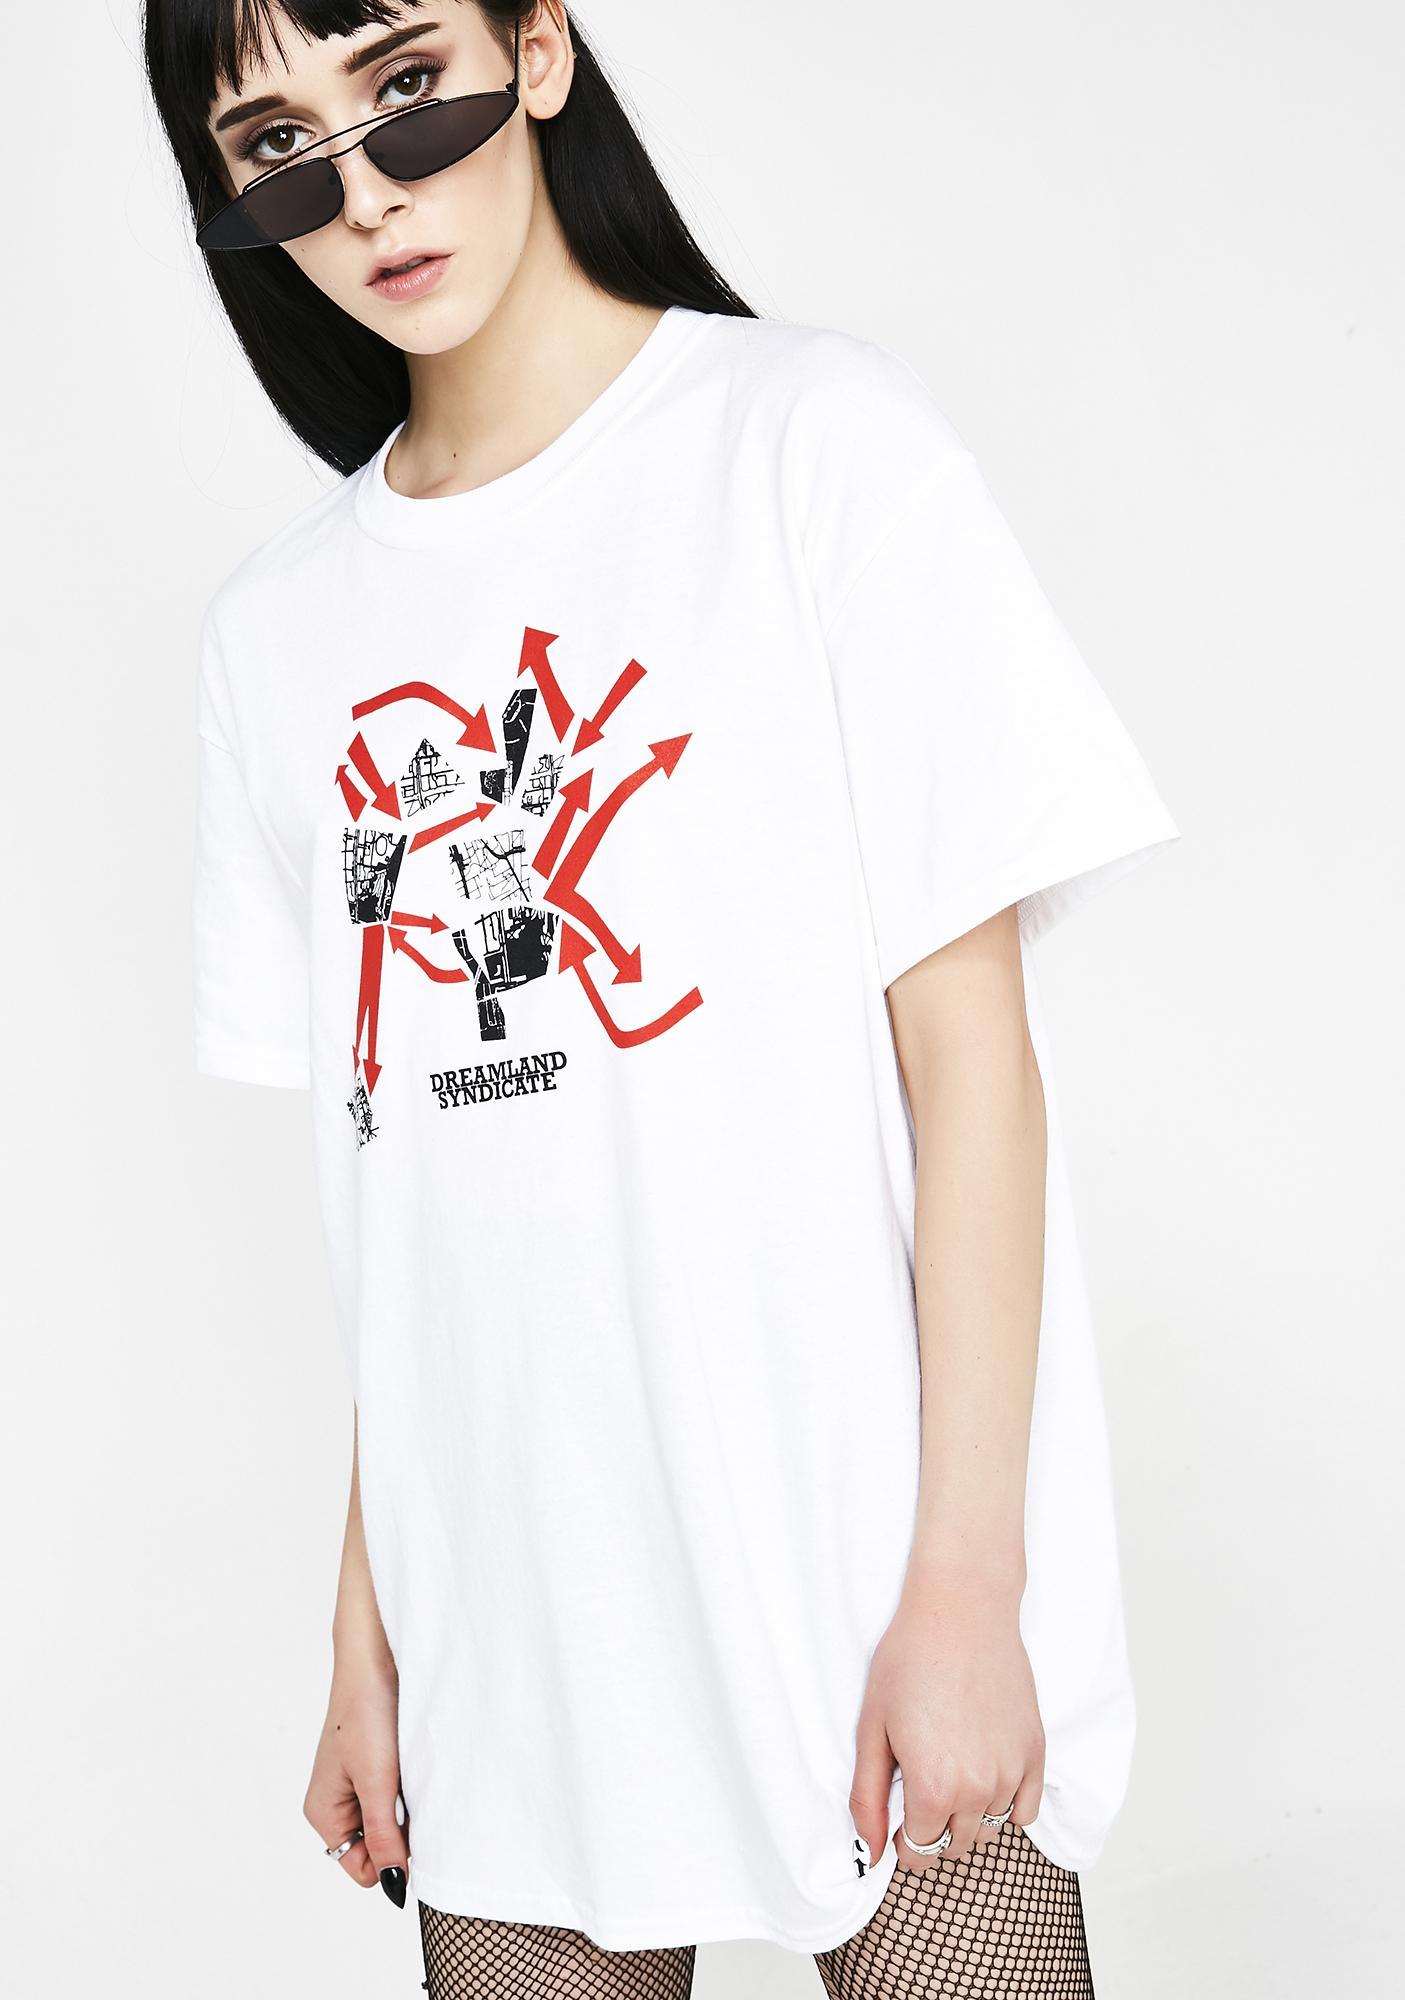 Dreamland Syndicate Psychogeography T-Shirt